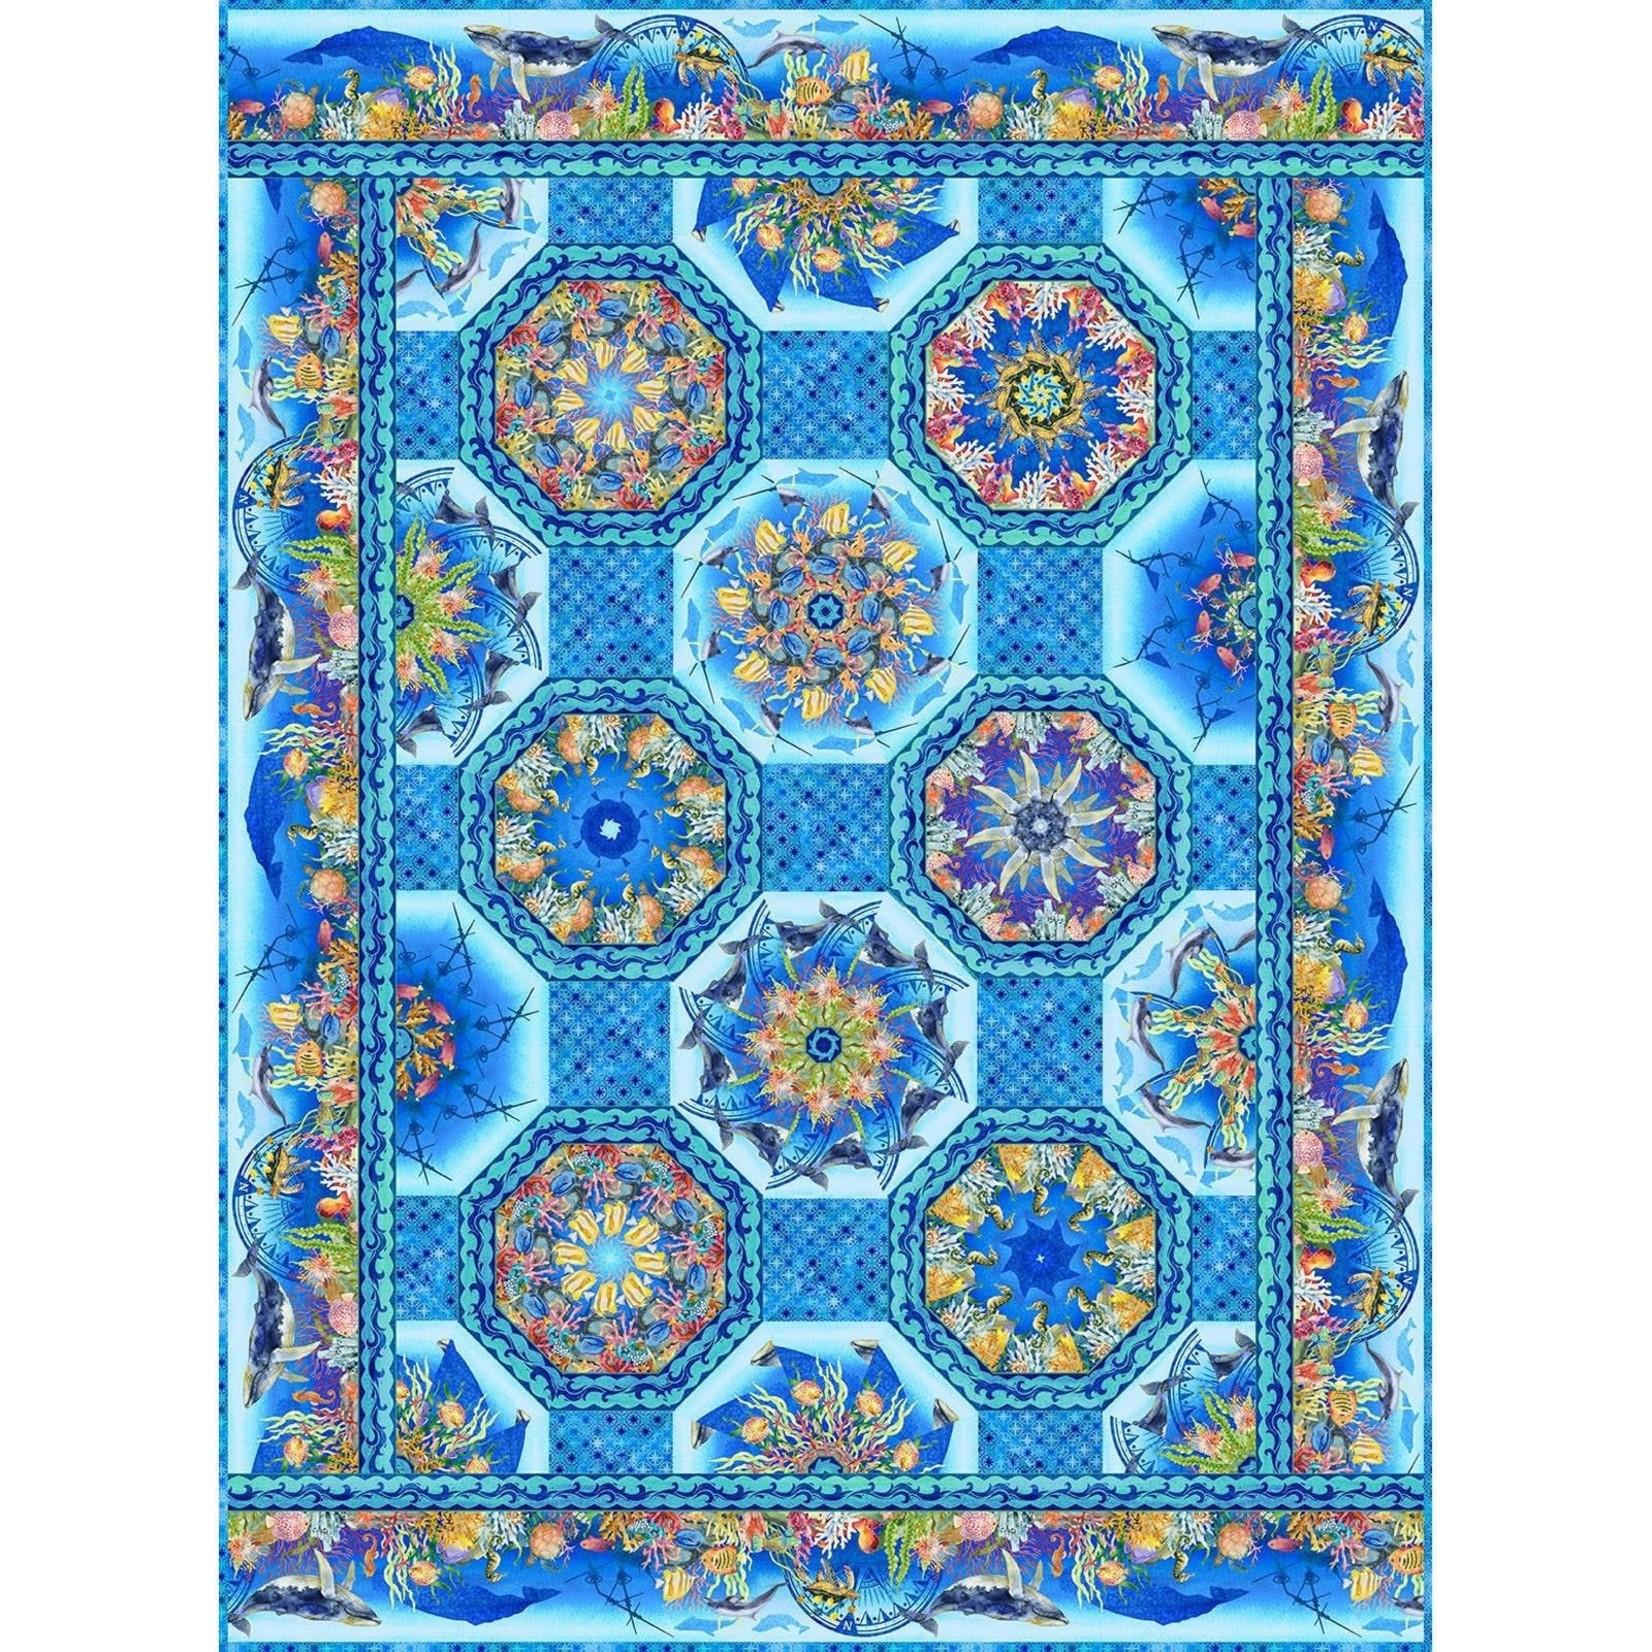 Calypso One - Fabric Kaleidoscope Quilt - Jason Yenter